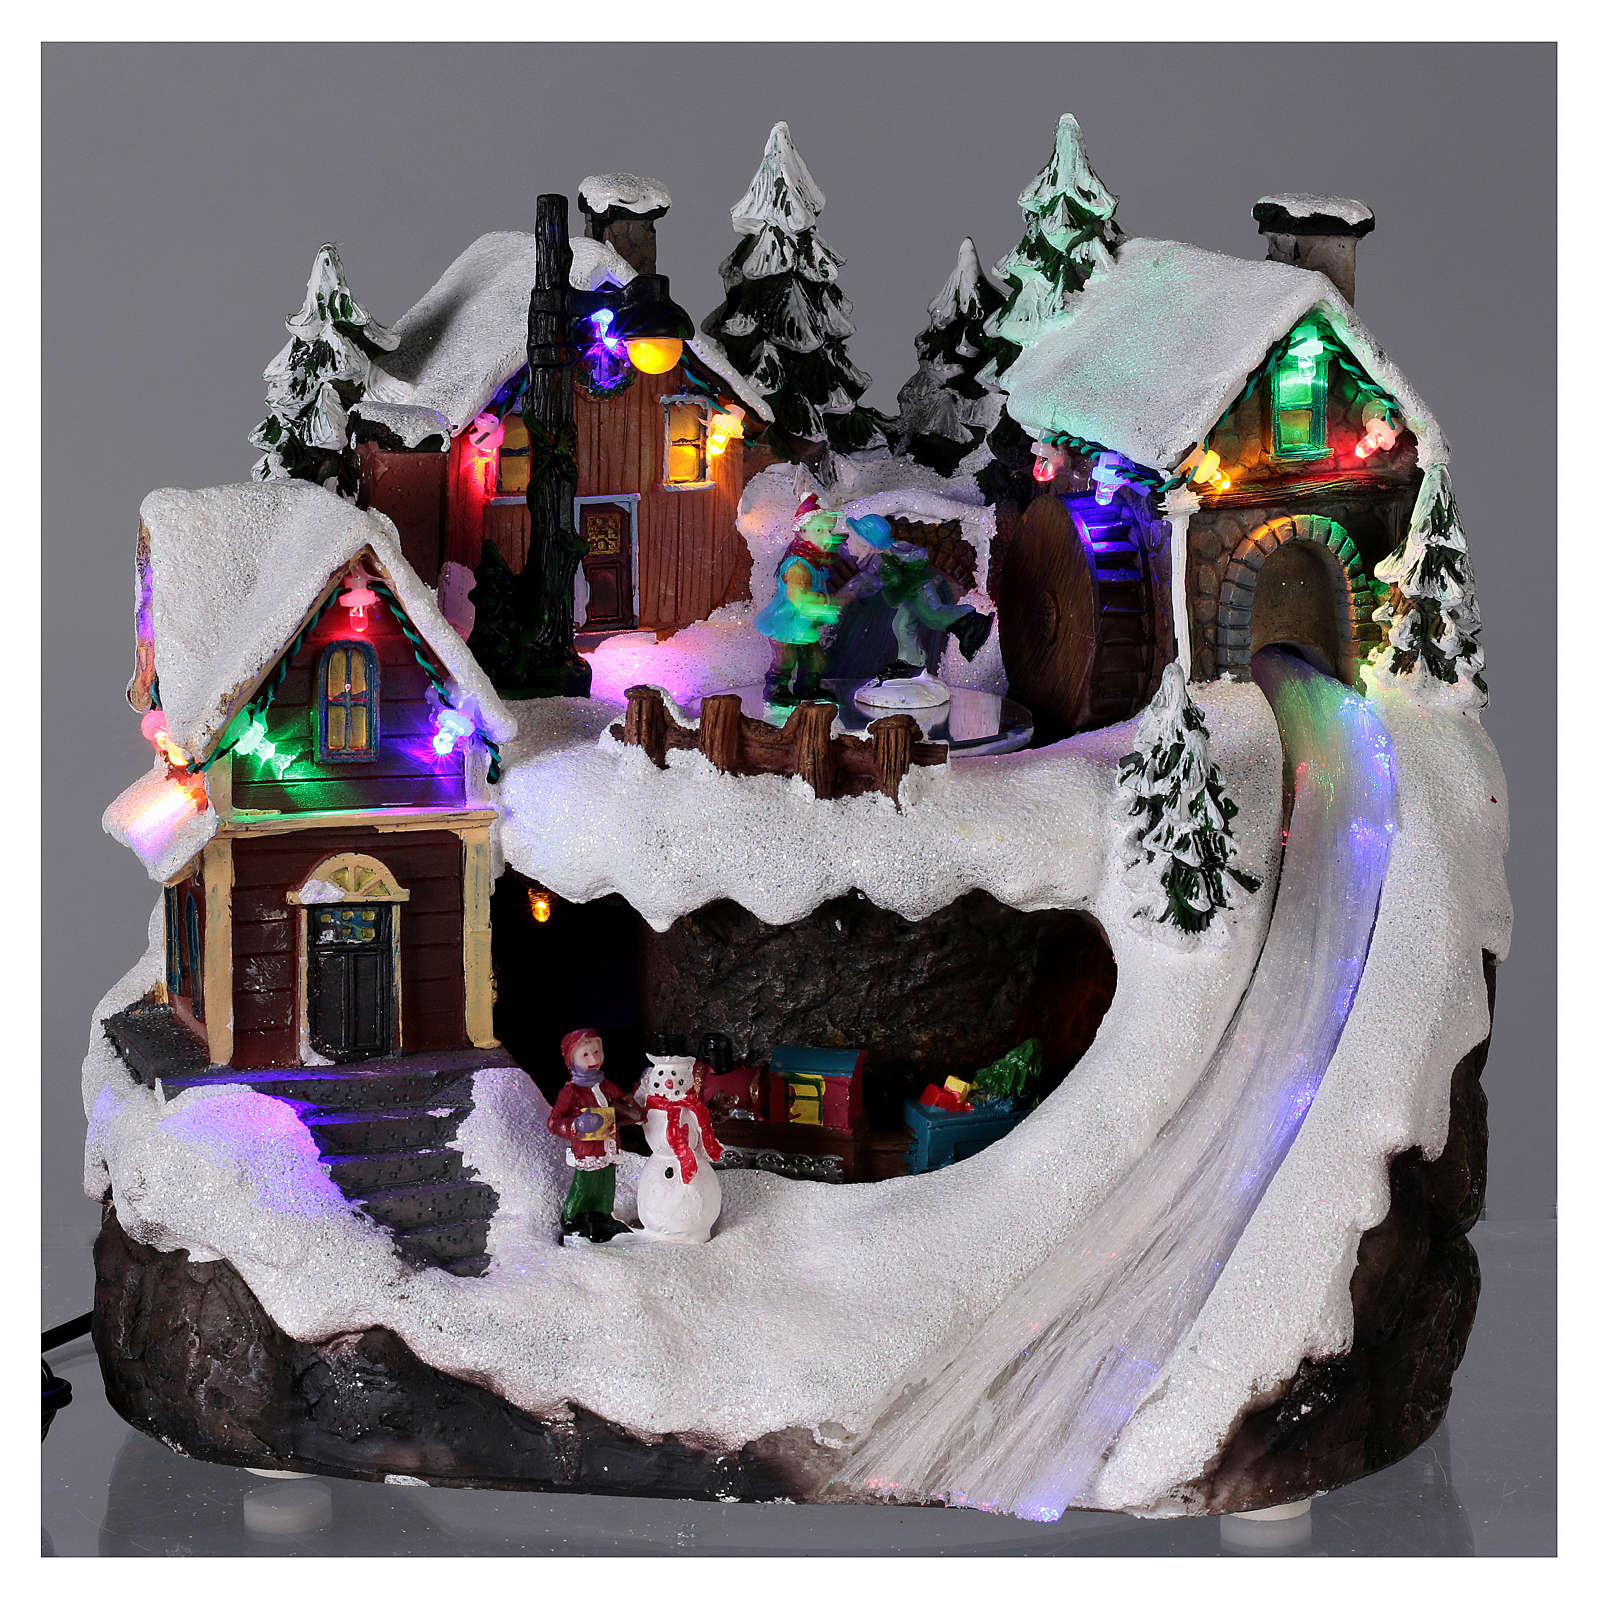 Christmas village illuminated with music, movement, train, iced lake 23X21X16 cm 3